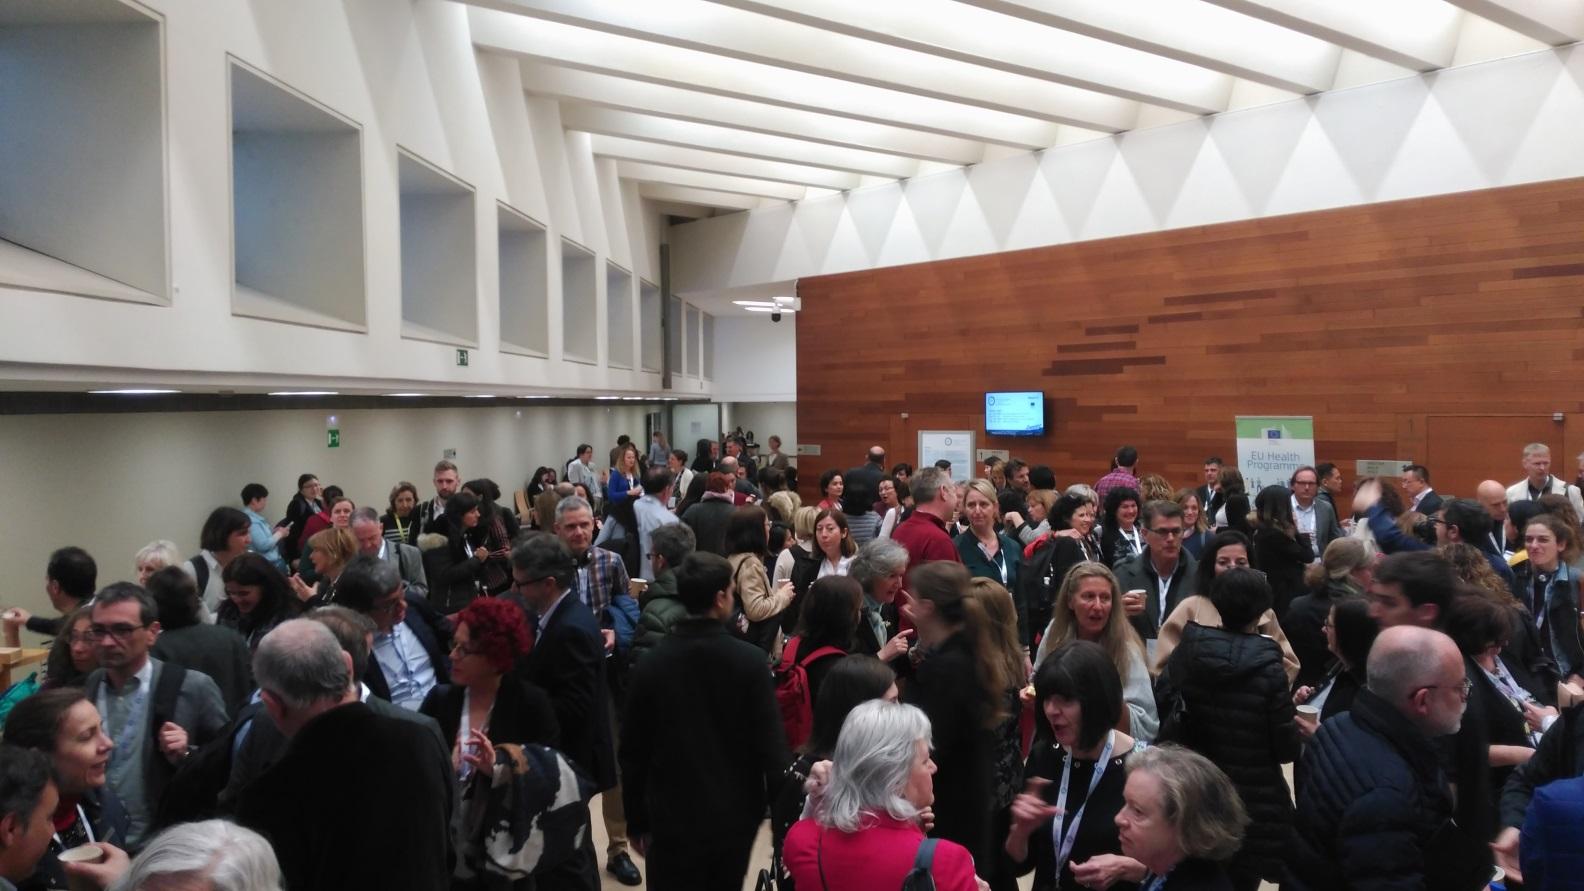 2019 International Congress on Integrated Care